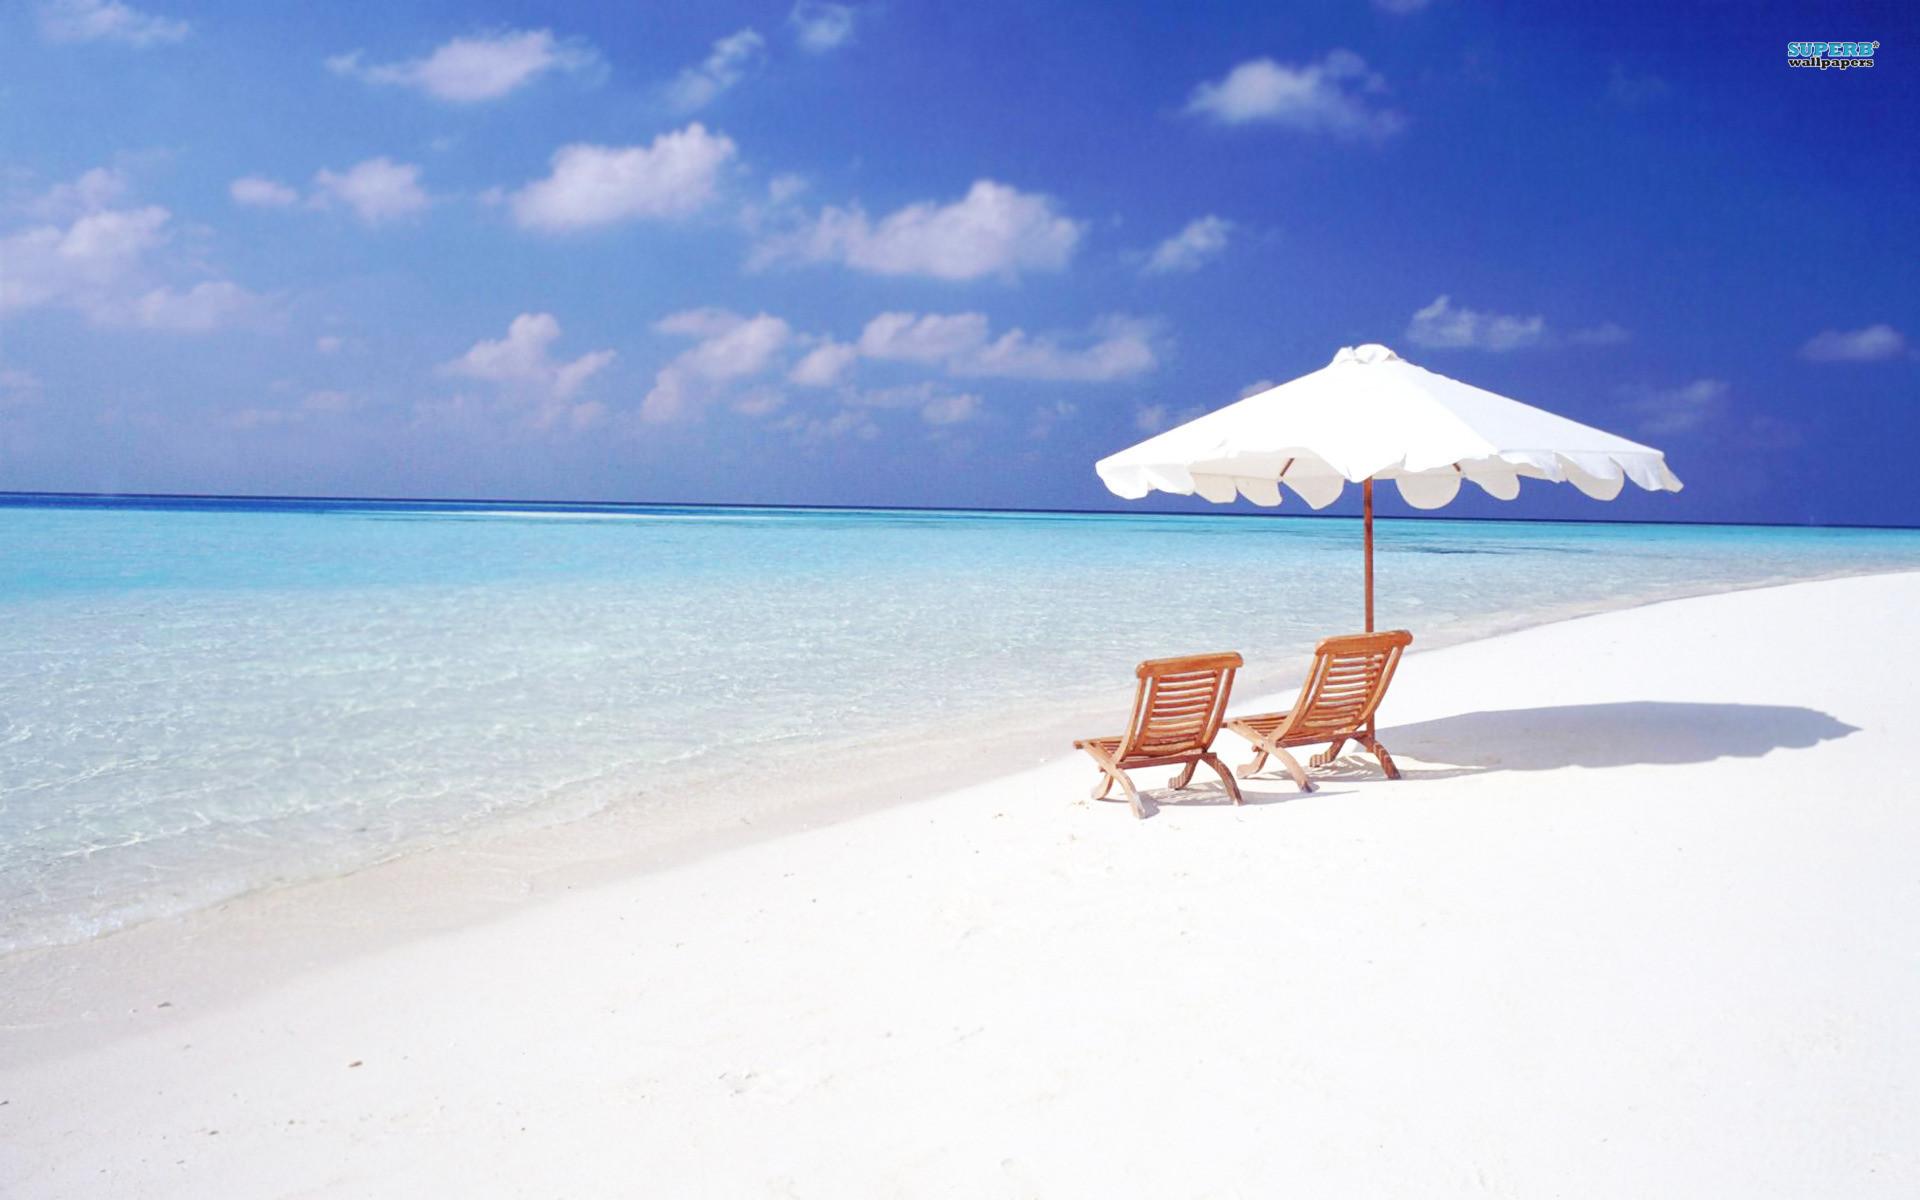 Goa Beach Parallax Hd Iphone Ipad Wallpaper: Summer Wallpaper Screensavers (58+ Images